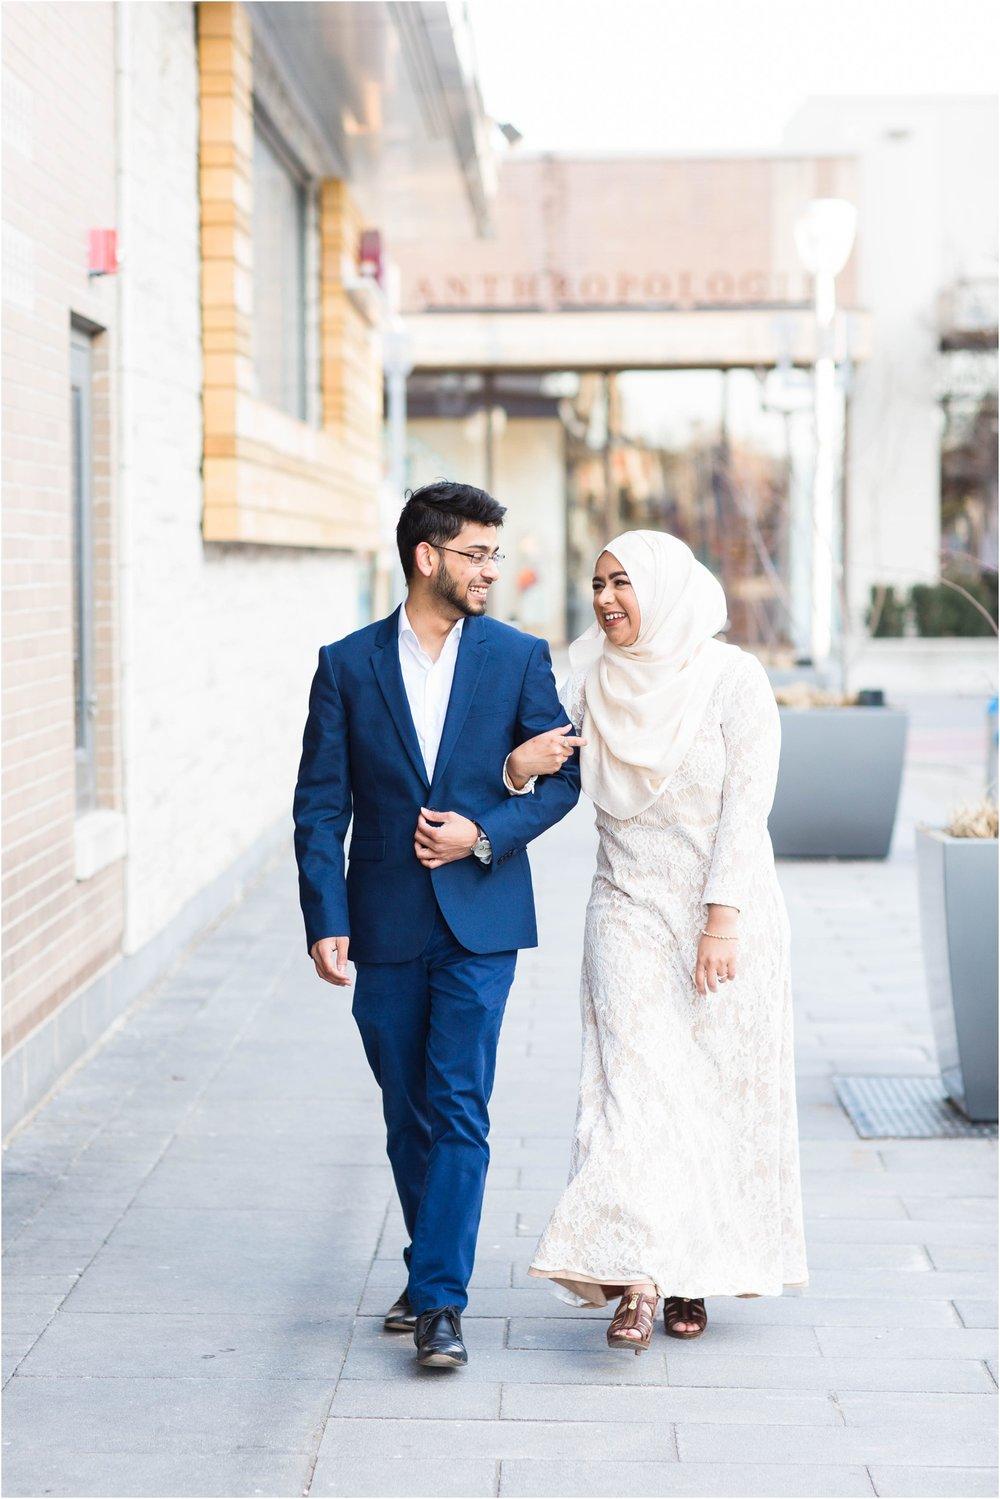 Shops-at-Don-Mills-Engagement-Session-Toronto-Mississauga-Brampton-Scarborough-GTA-Pakistani-Indian-Wedding-Engagement-Photographer-Photography_0010.jpg